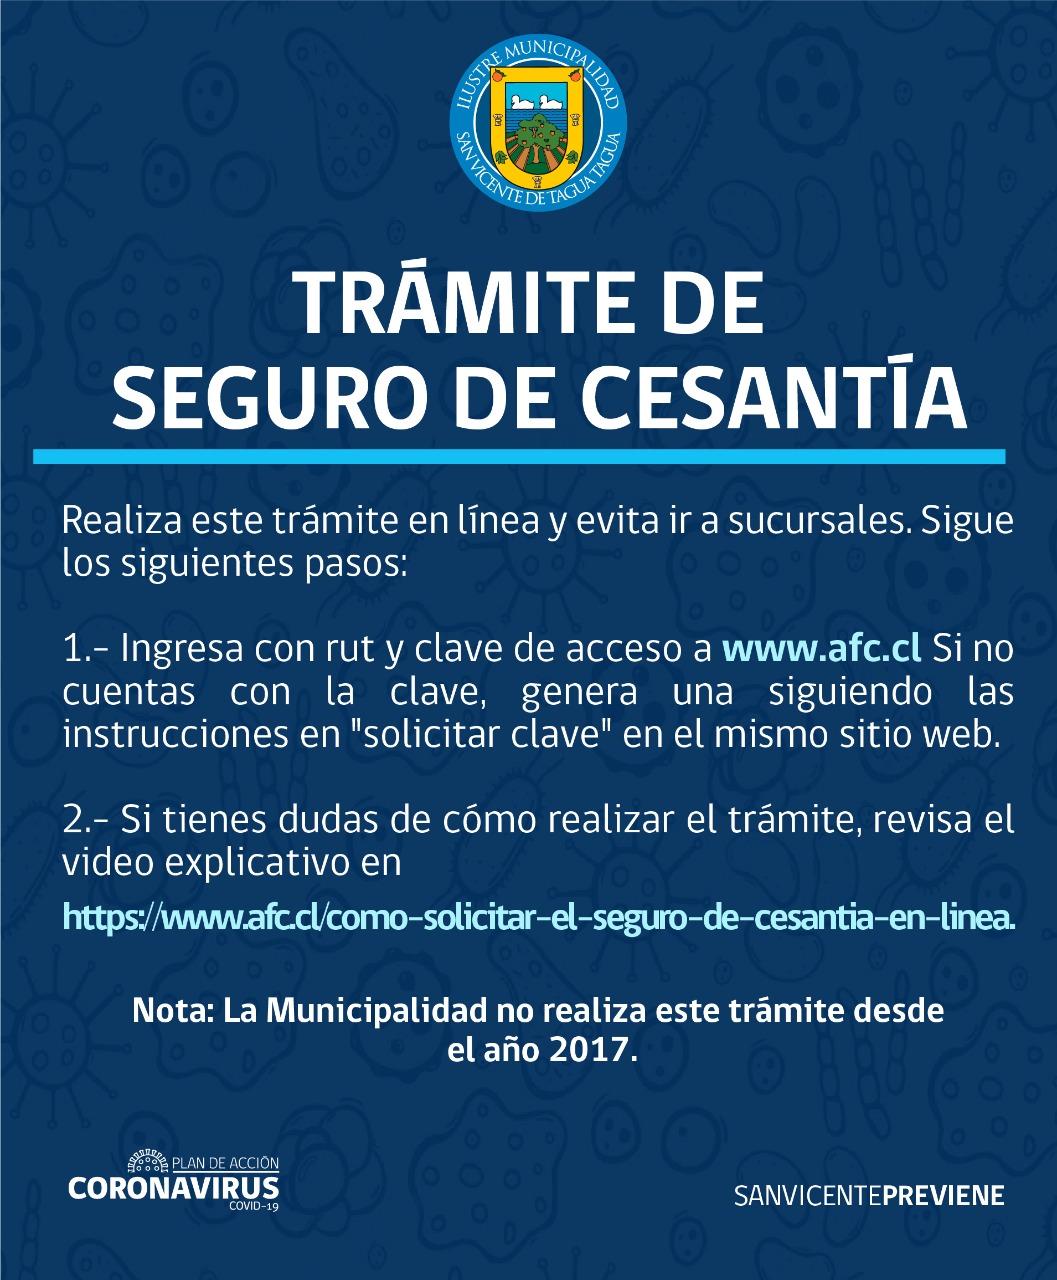 TRÁMITE SEGURO DE CESANTÍA